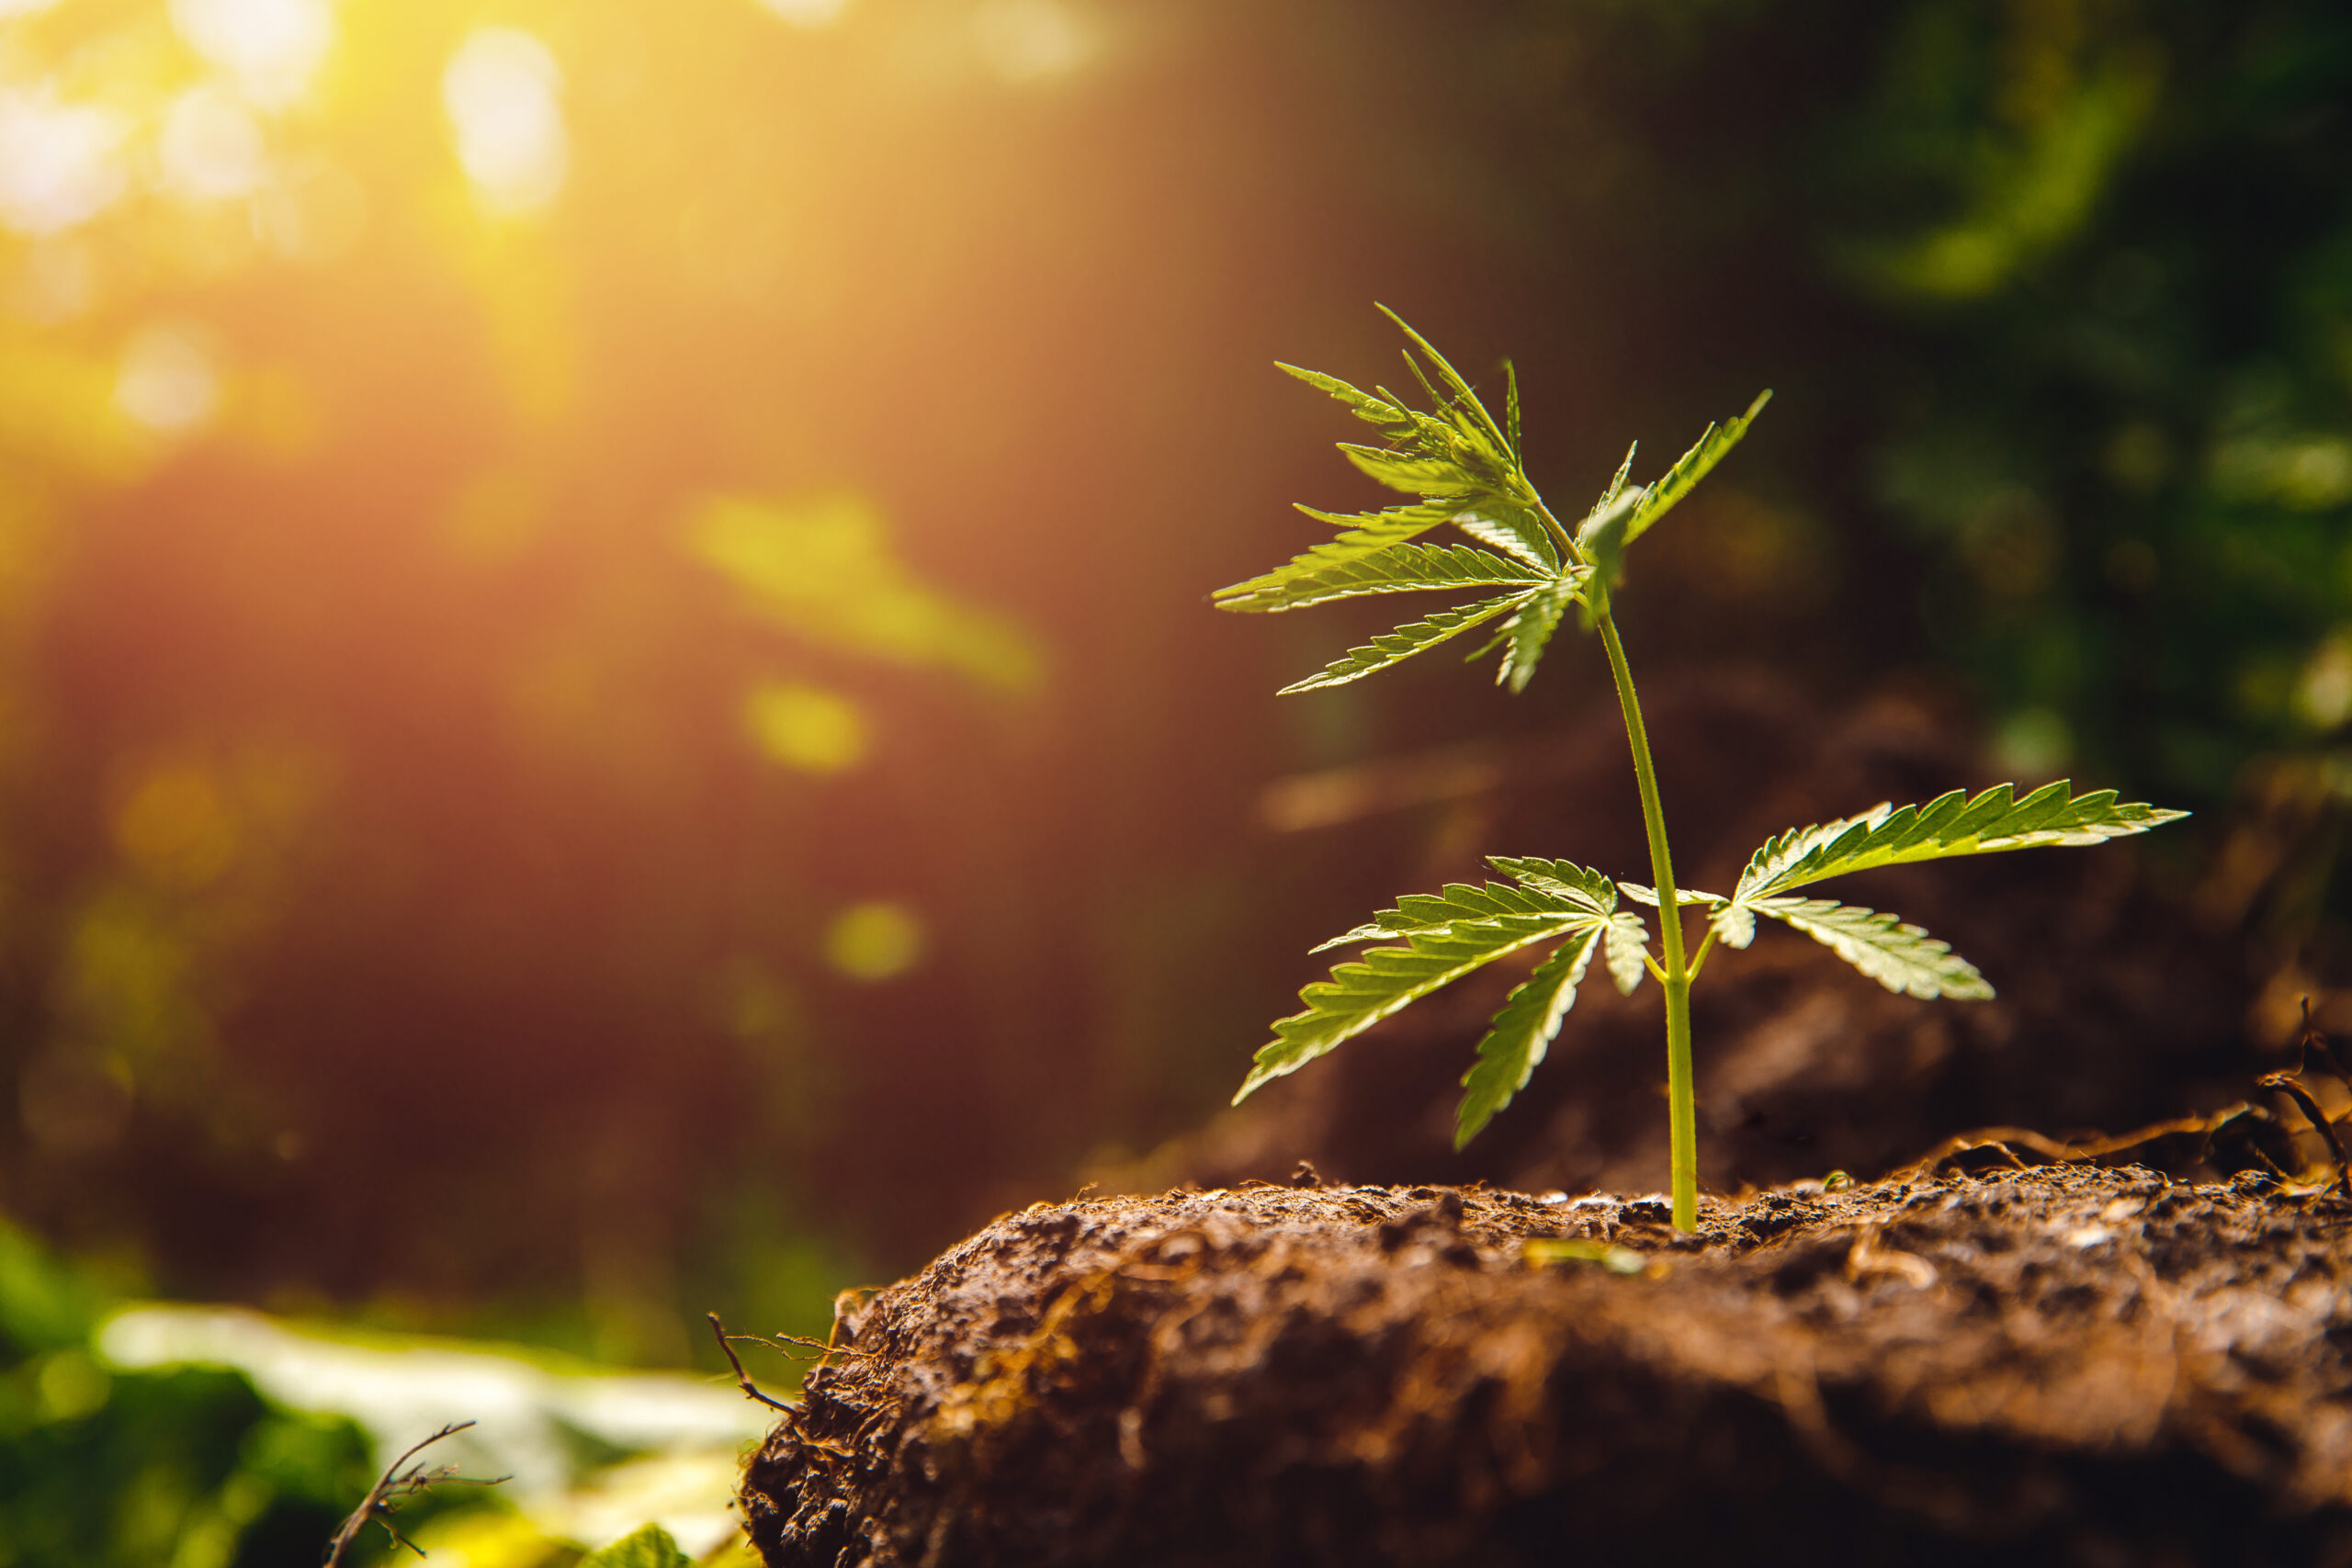 Bush marijuana cannabis on blurred background at sunset.